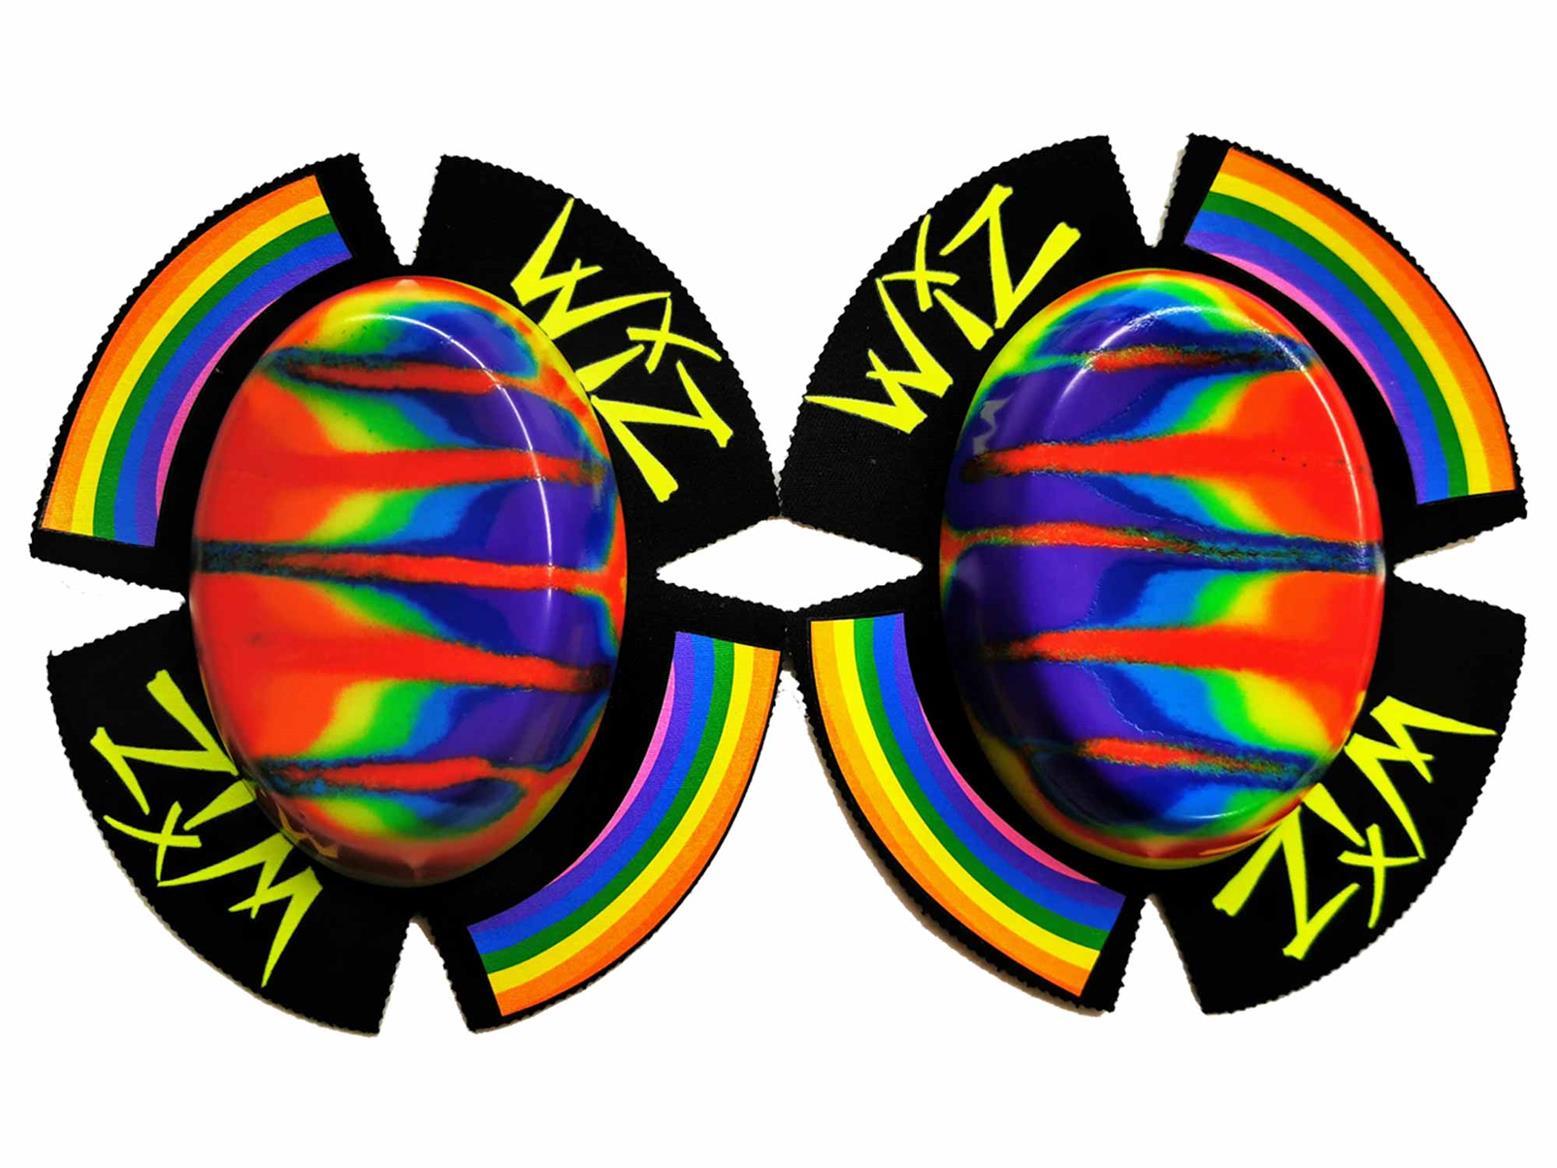 WIZ Knee Sliders produce NHS charity range in response to Coronavirus | MCN